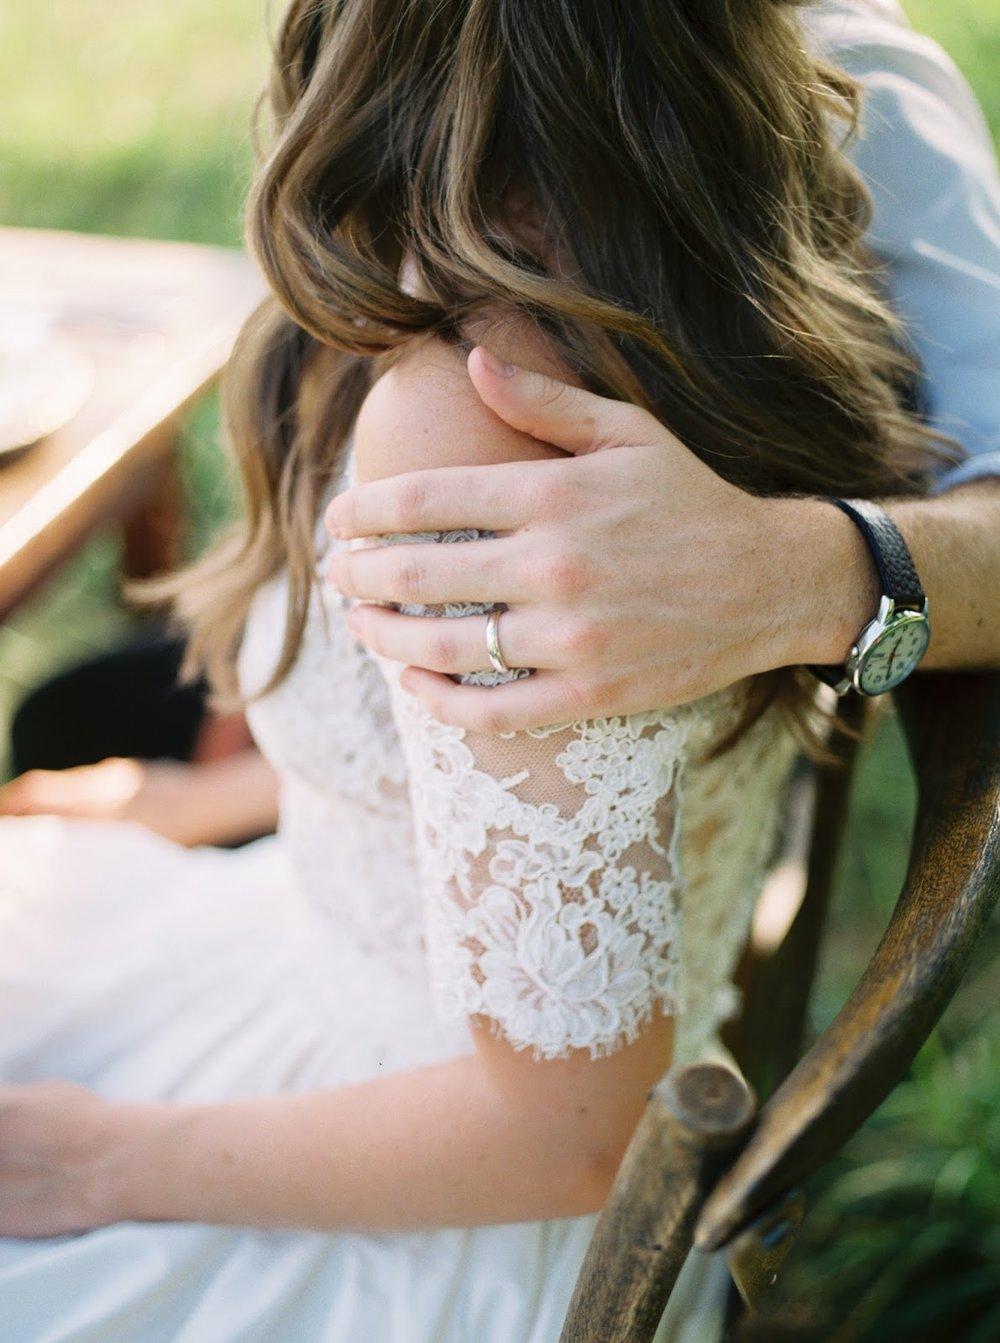 Sevier_Blumen_Editorial_Abigail_Malone_Photography-190.jpg